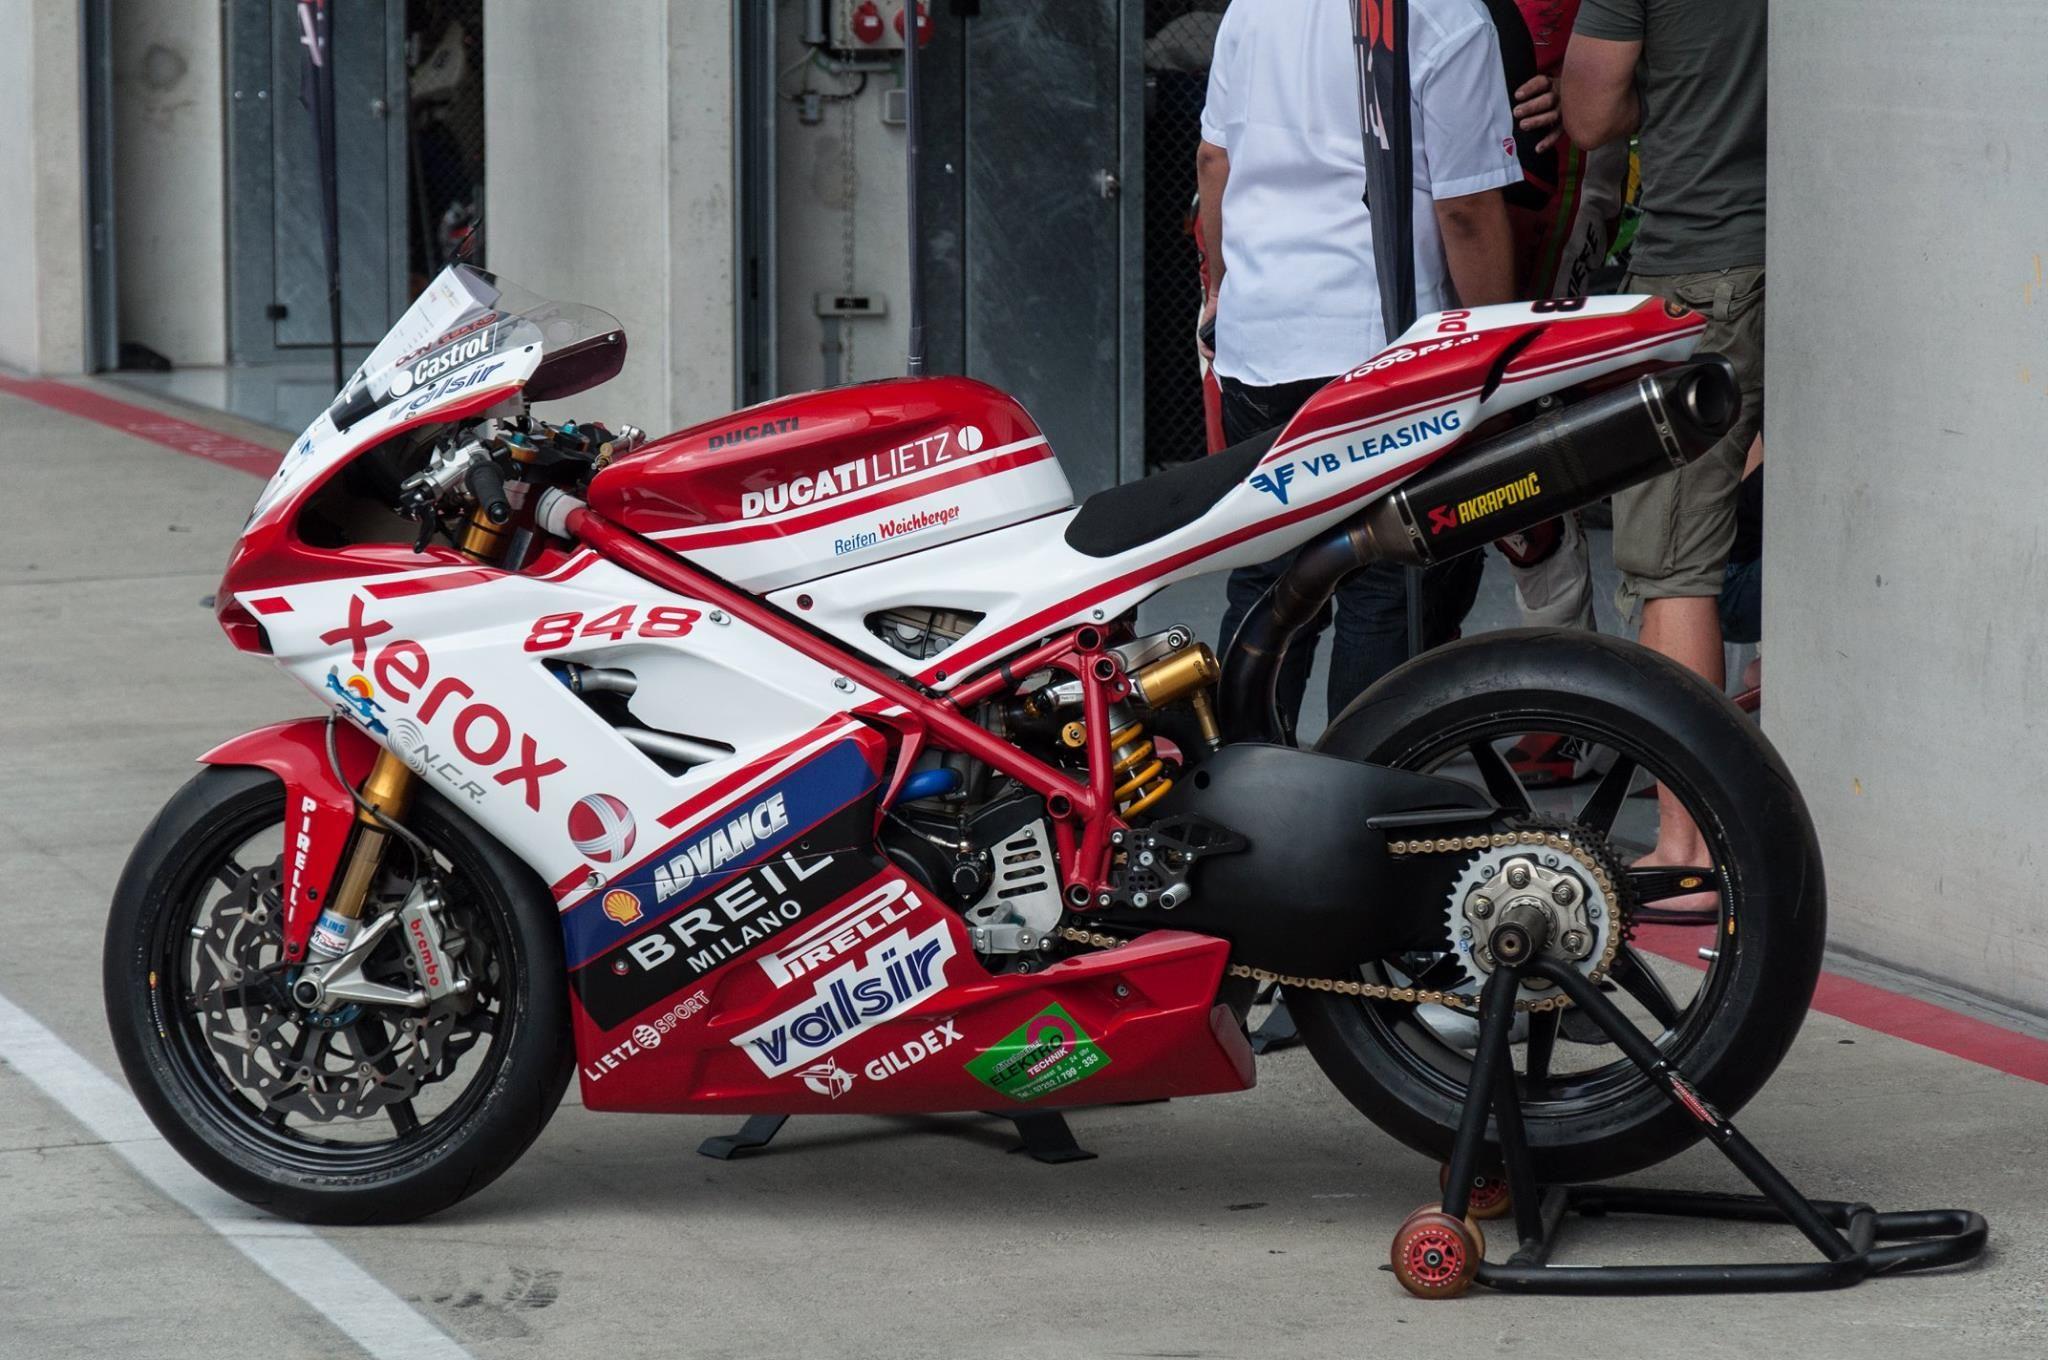 Very Good Looking 1198 Race Bike Dmbc Fb Like The Idea Of